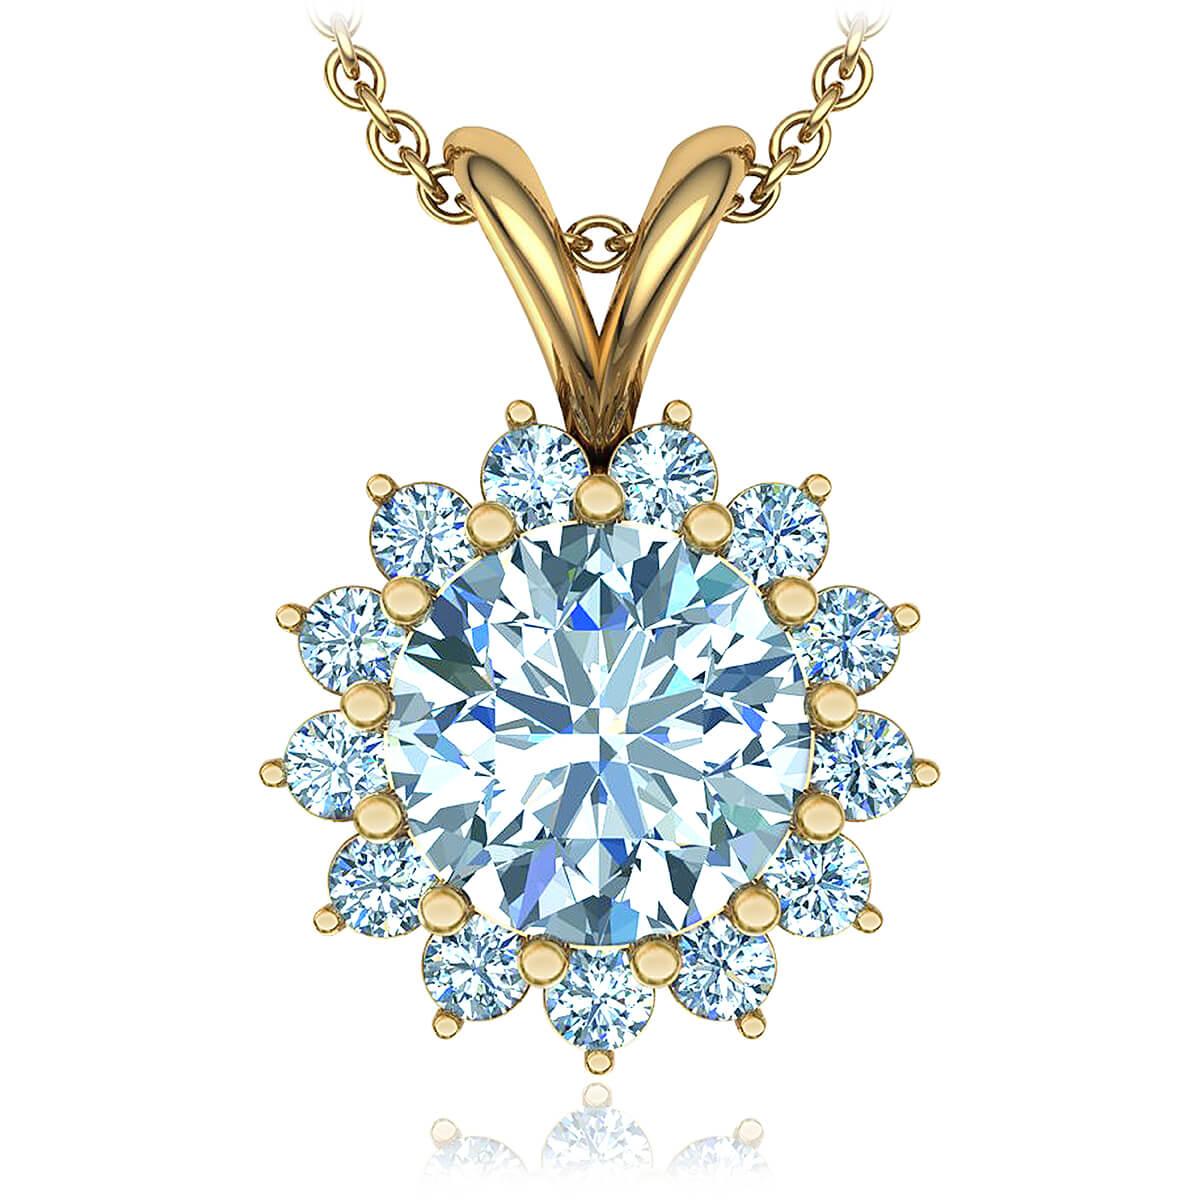 Passion Flower Diamond Necklace (1/2 CT. TW.)